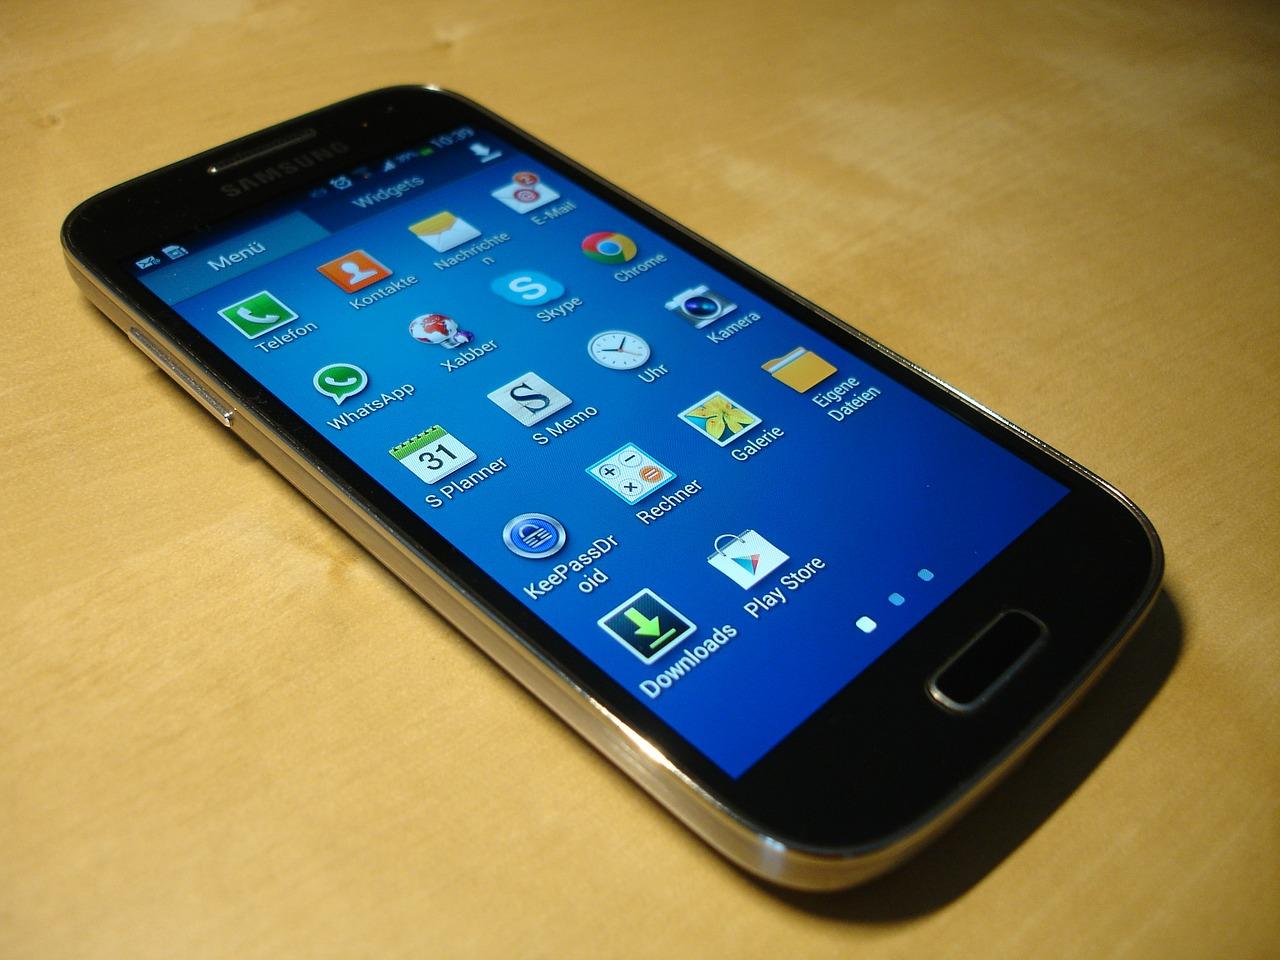 Konfiguration Handy Smartphones Tablet Pcs Ios Amp Android